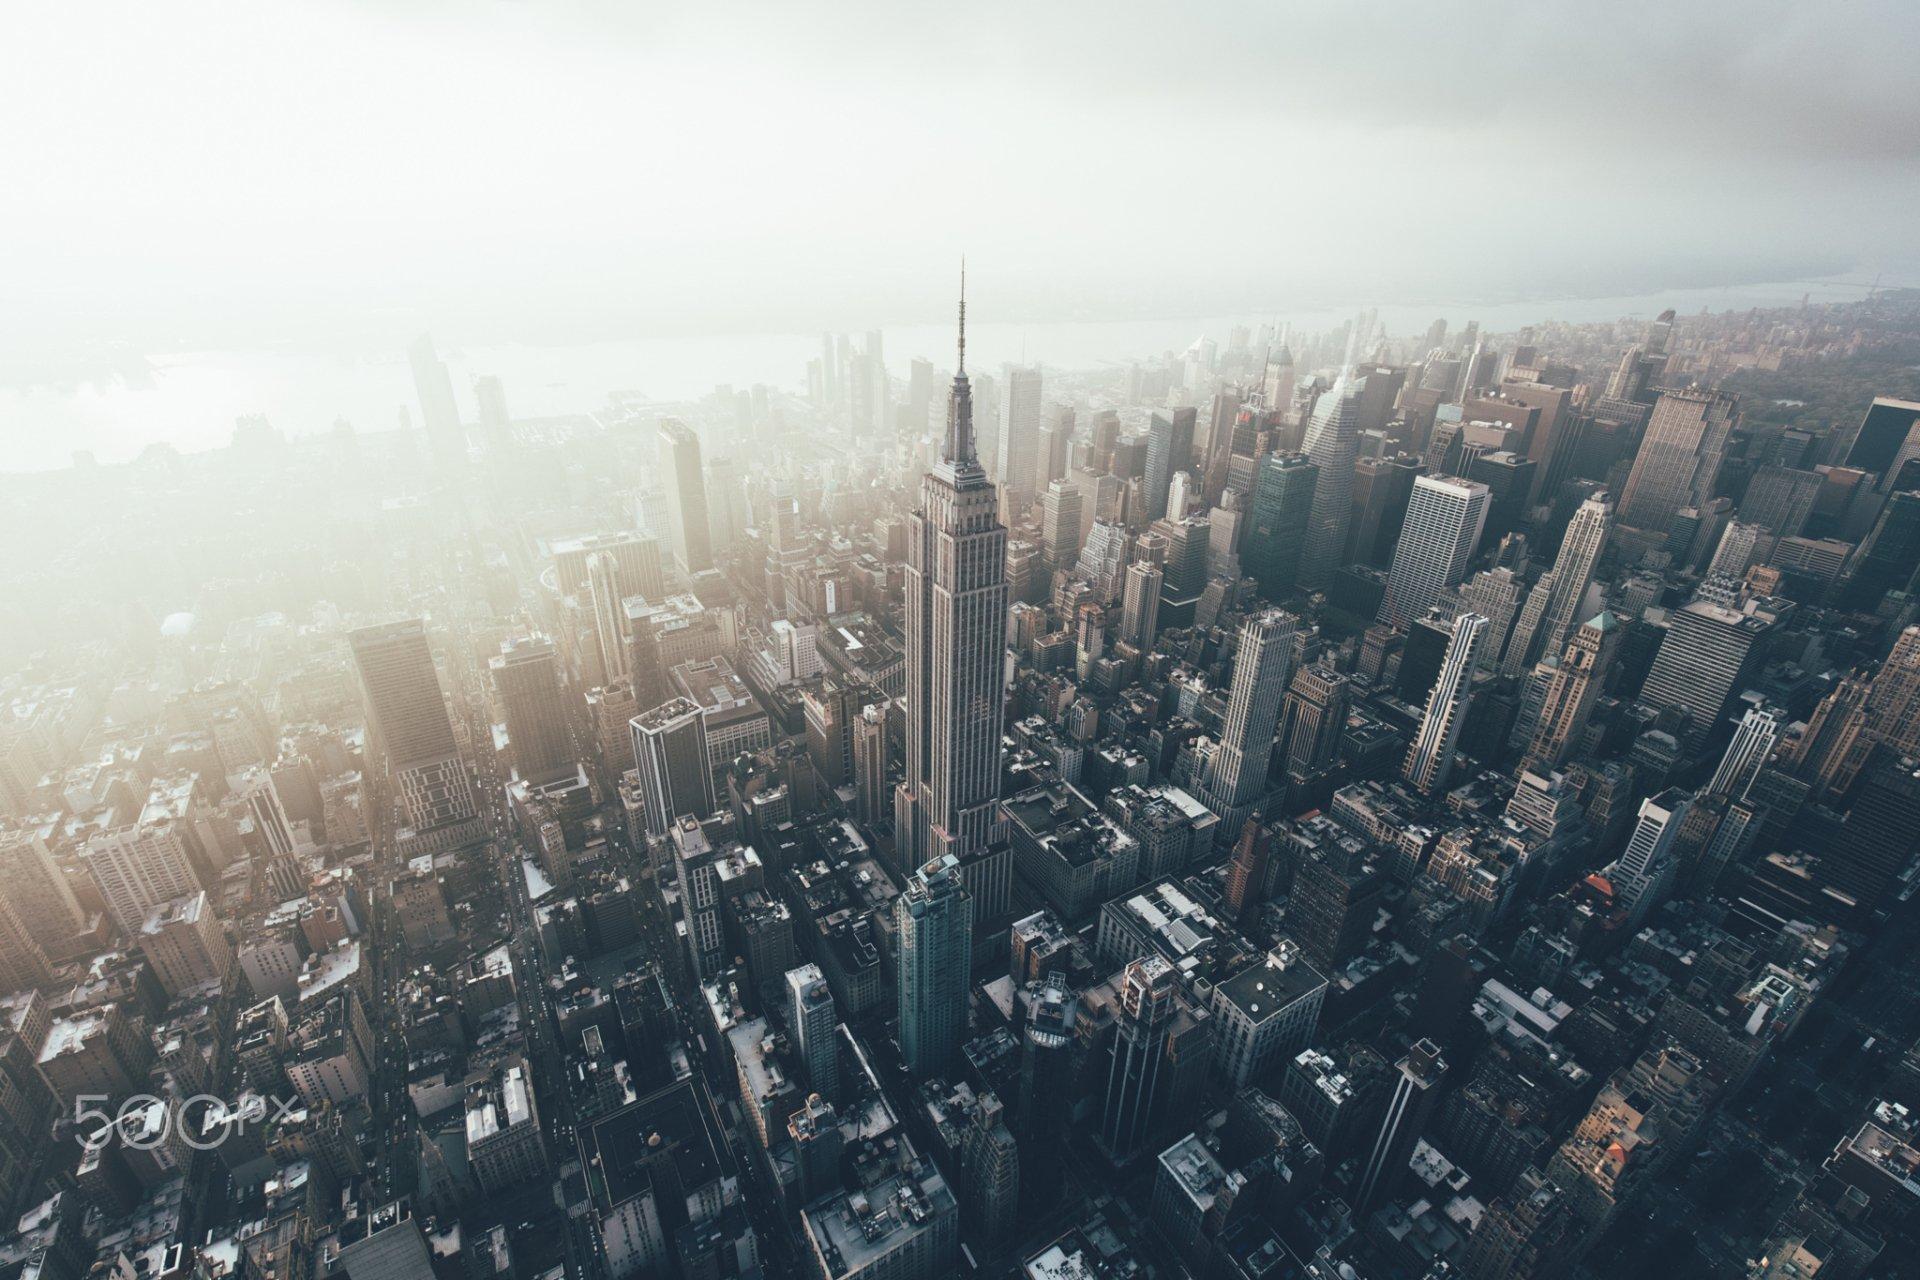 Man Made - New York  Skyscraper City USA Aerial Building Wallpaper